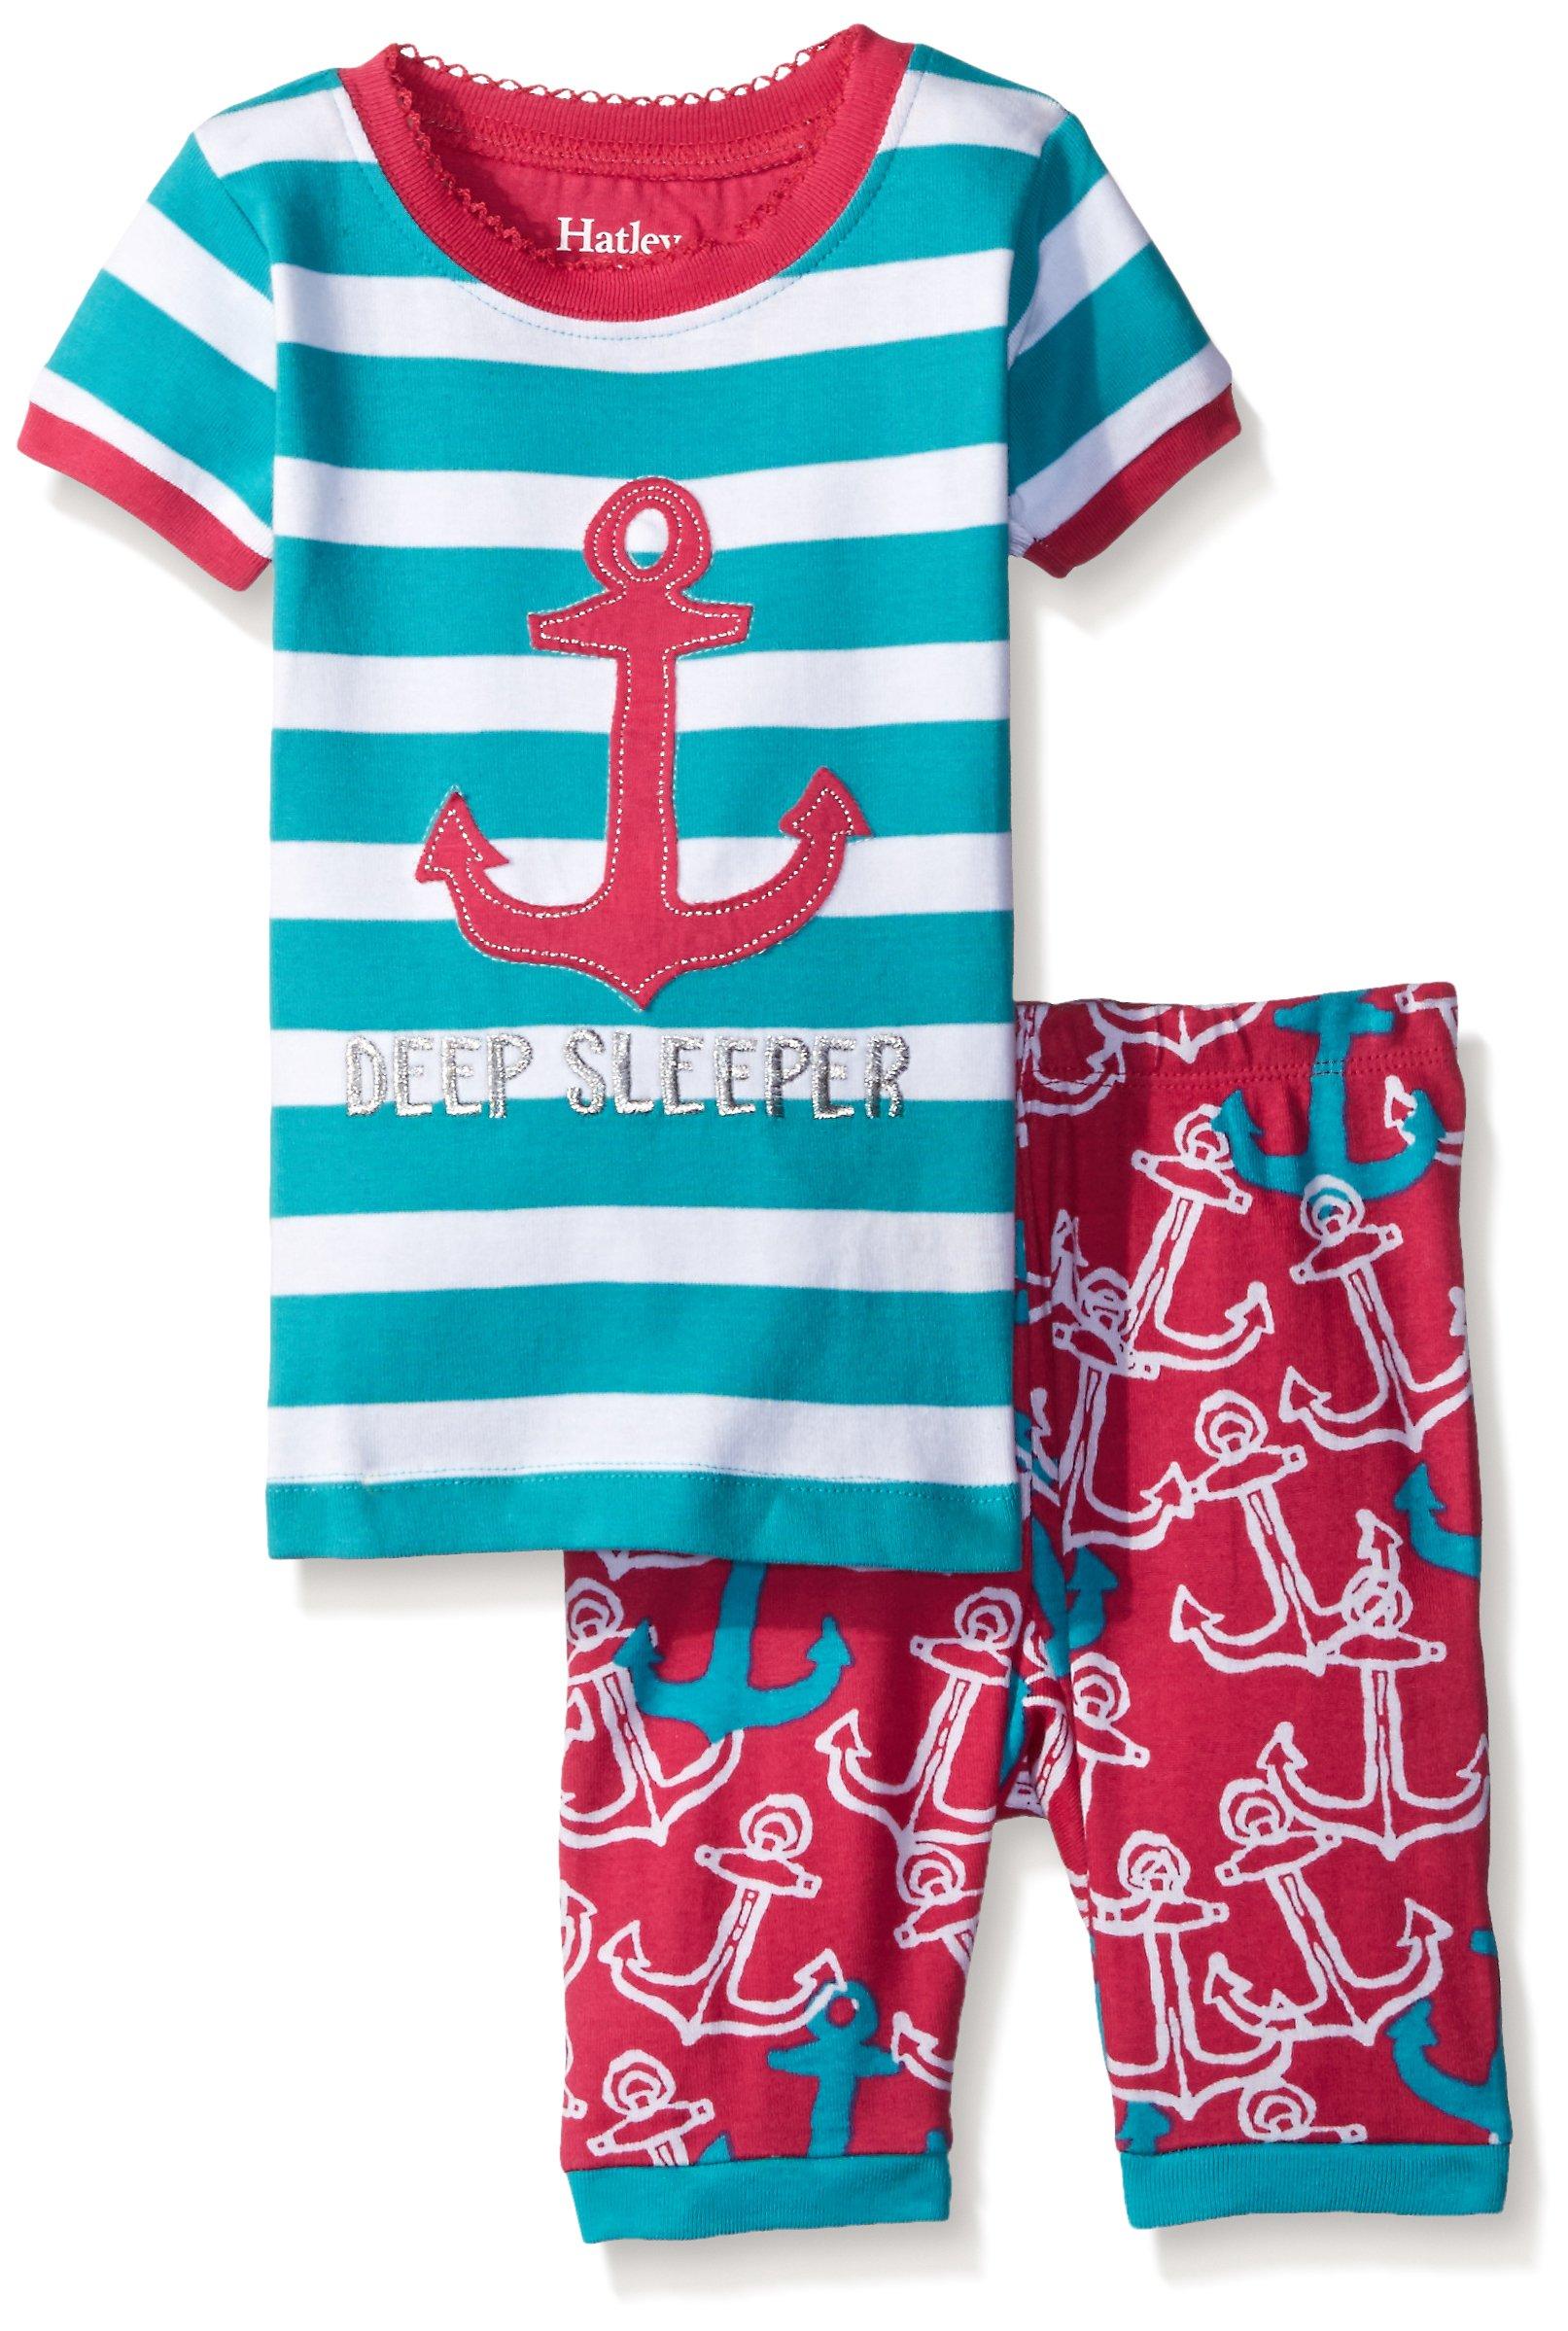 Hatley Kids Girl's Painted Anchors Short PJ Set (Toddler/Little Kids/Big Kids) Light Blue 3T (Toddler)